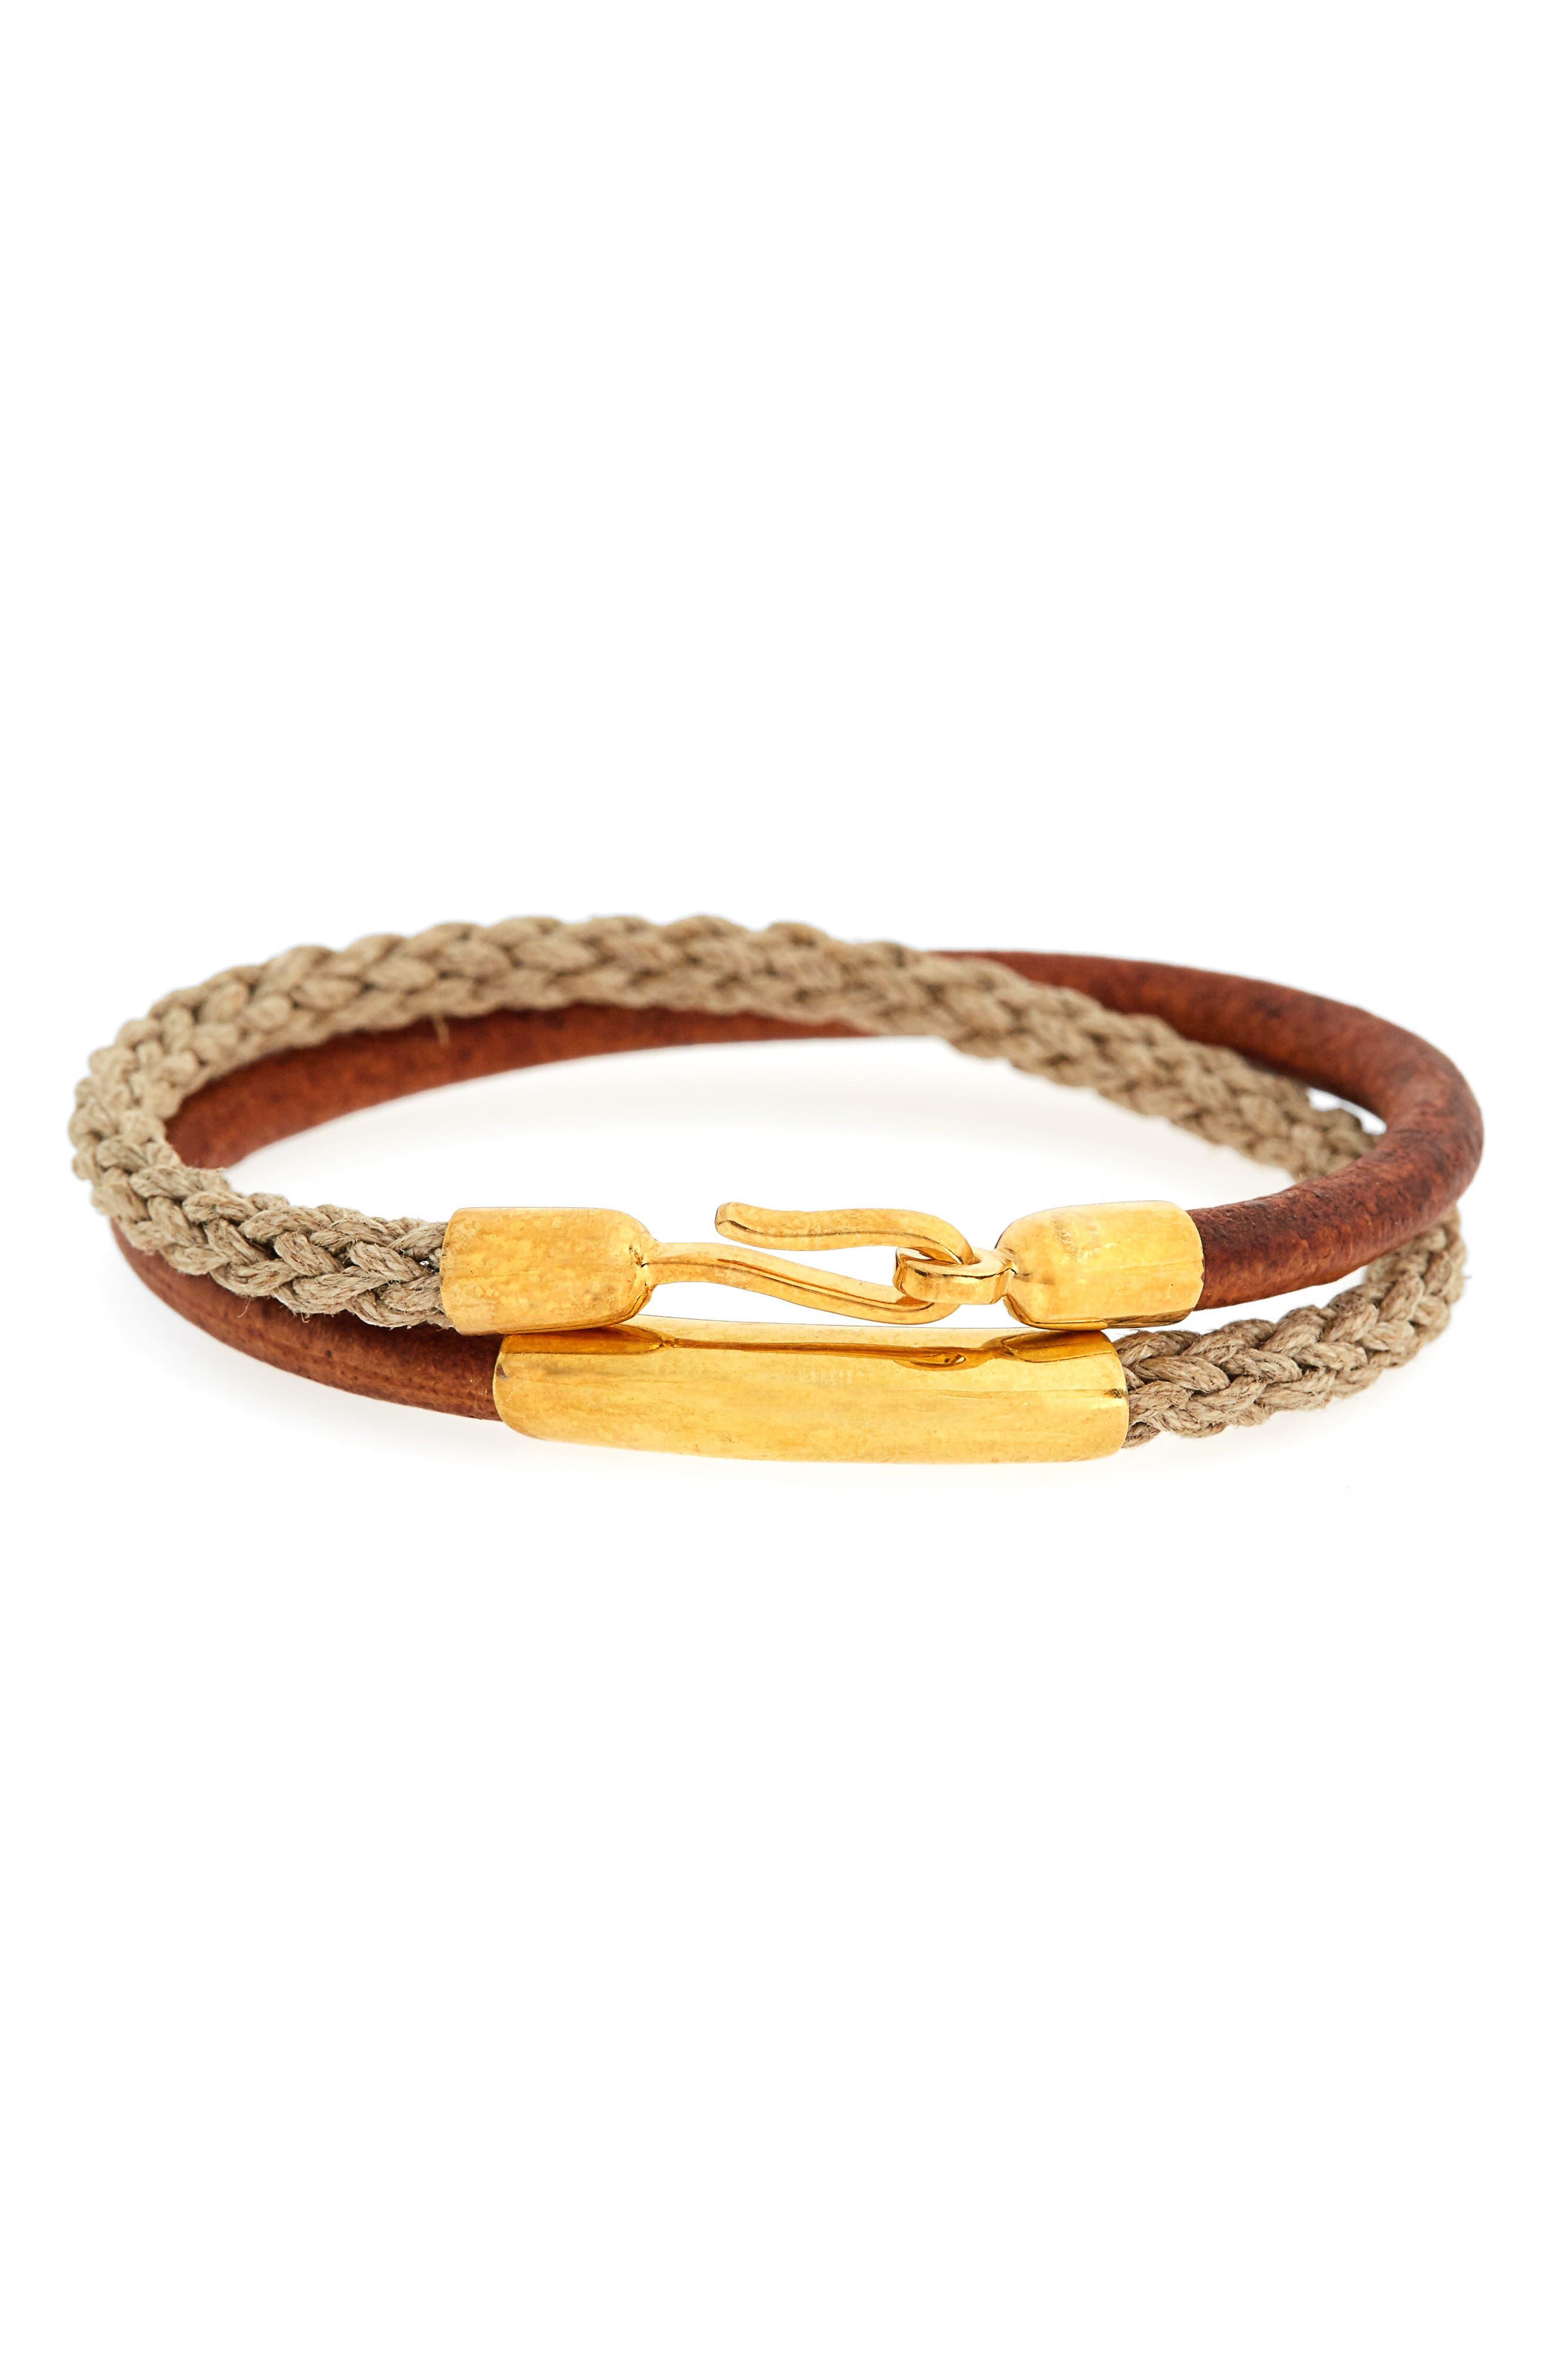 Leather & Jute Wrap Bracelet,                             Main thumbnail 1, color,                             Tan